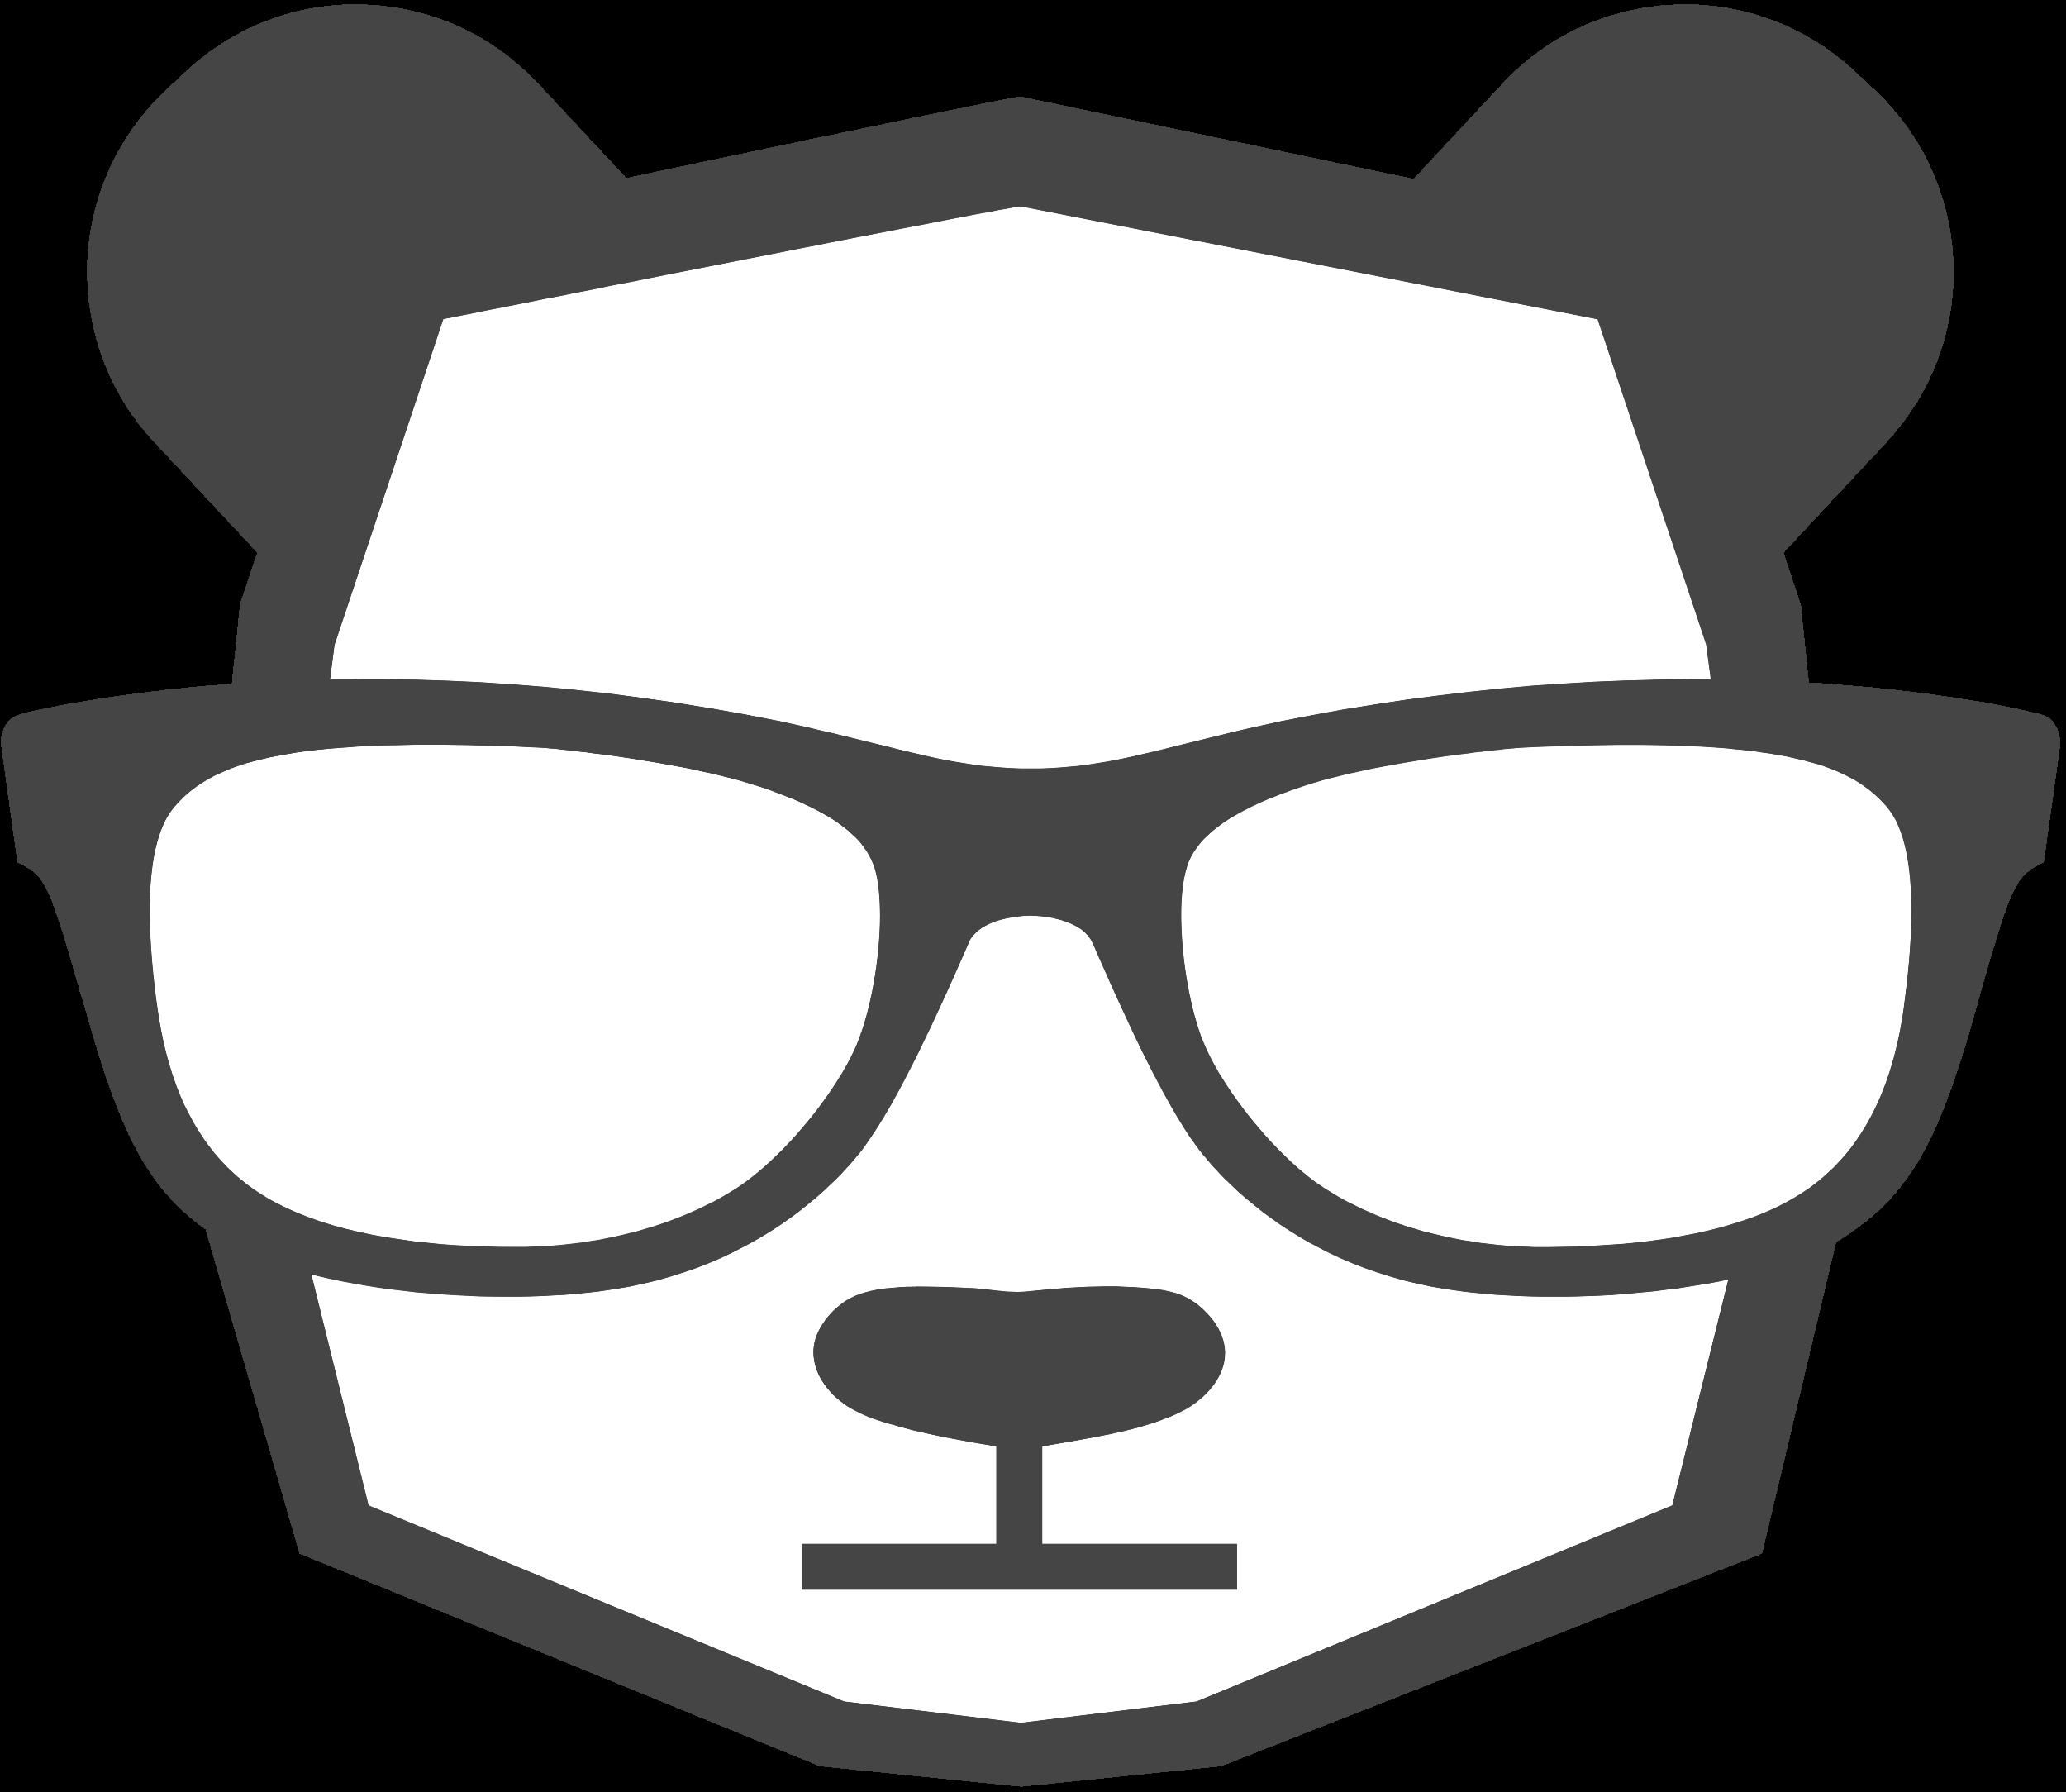 Logotipo de Big Panda